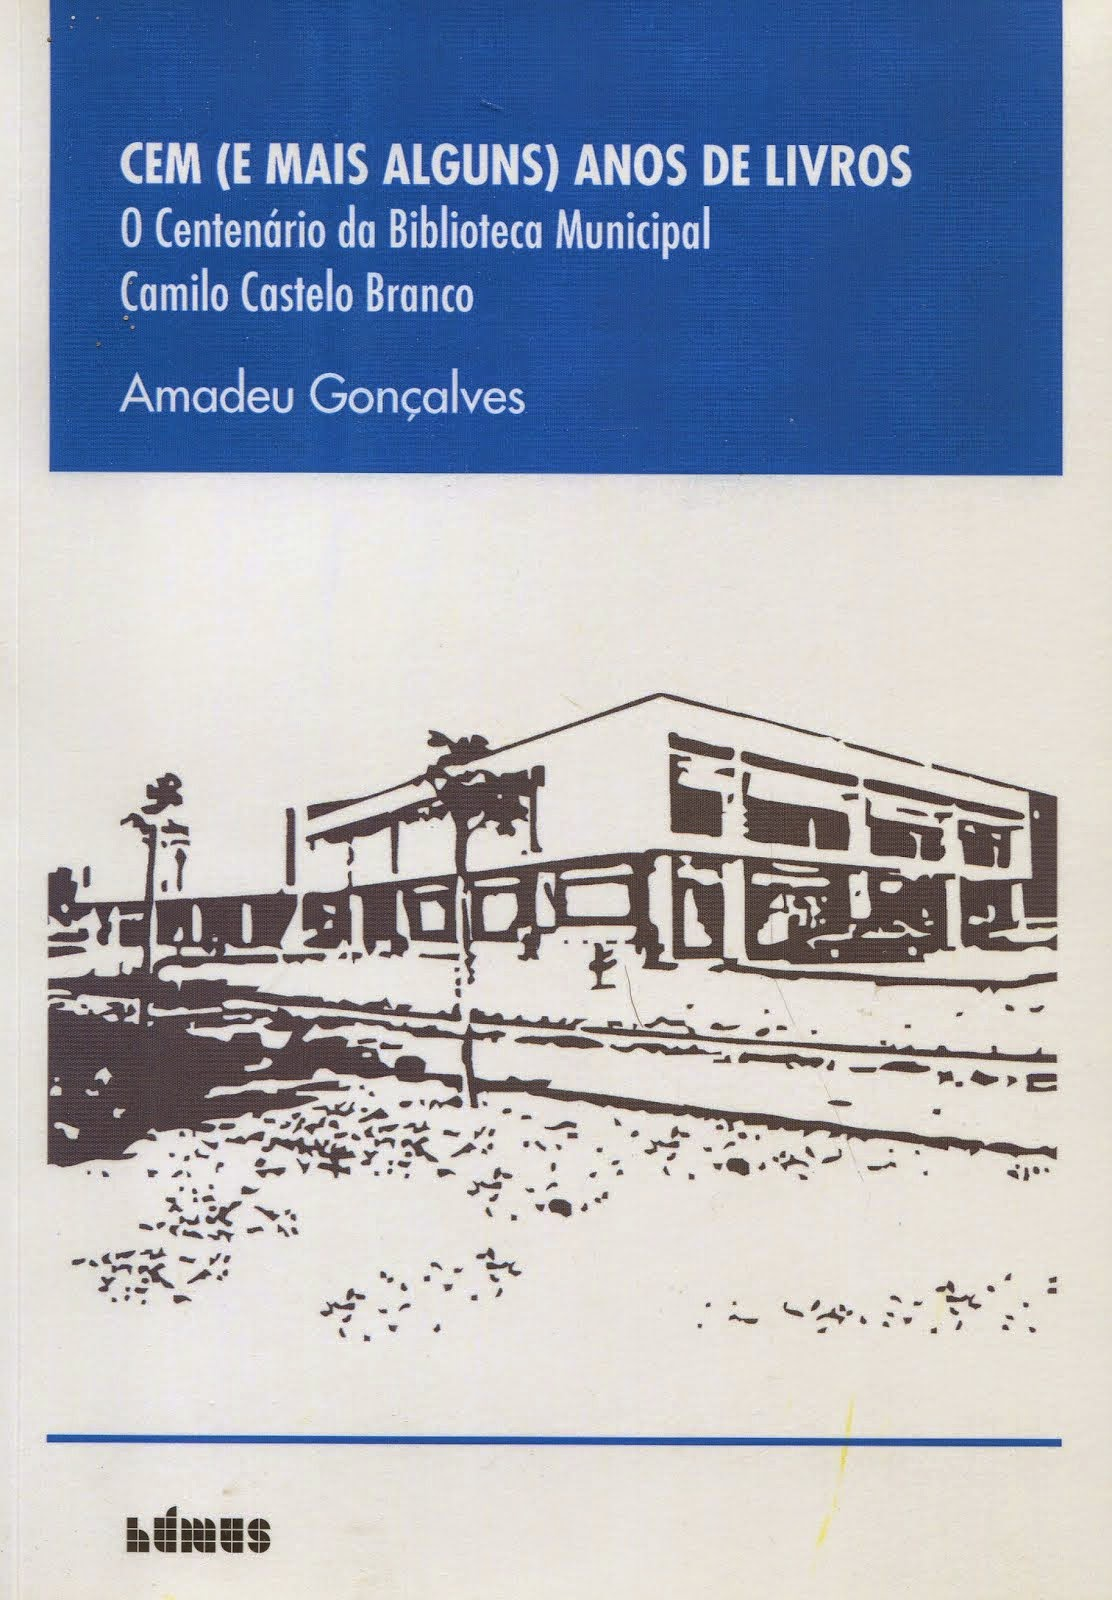 Biblioteca Municipal Camilo Castelo Branco